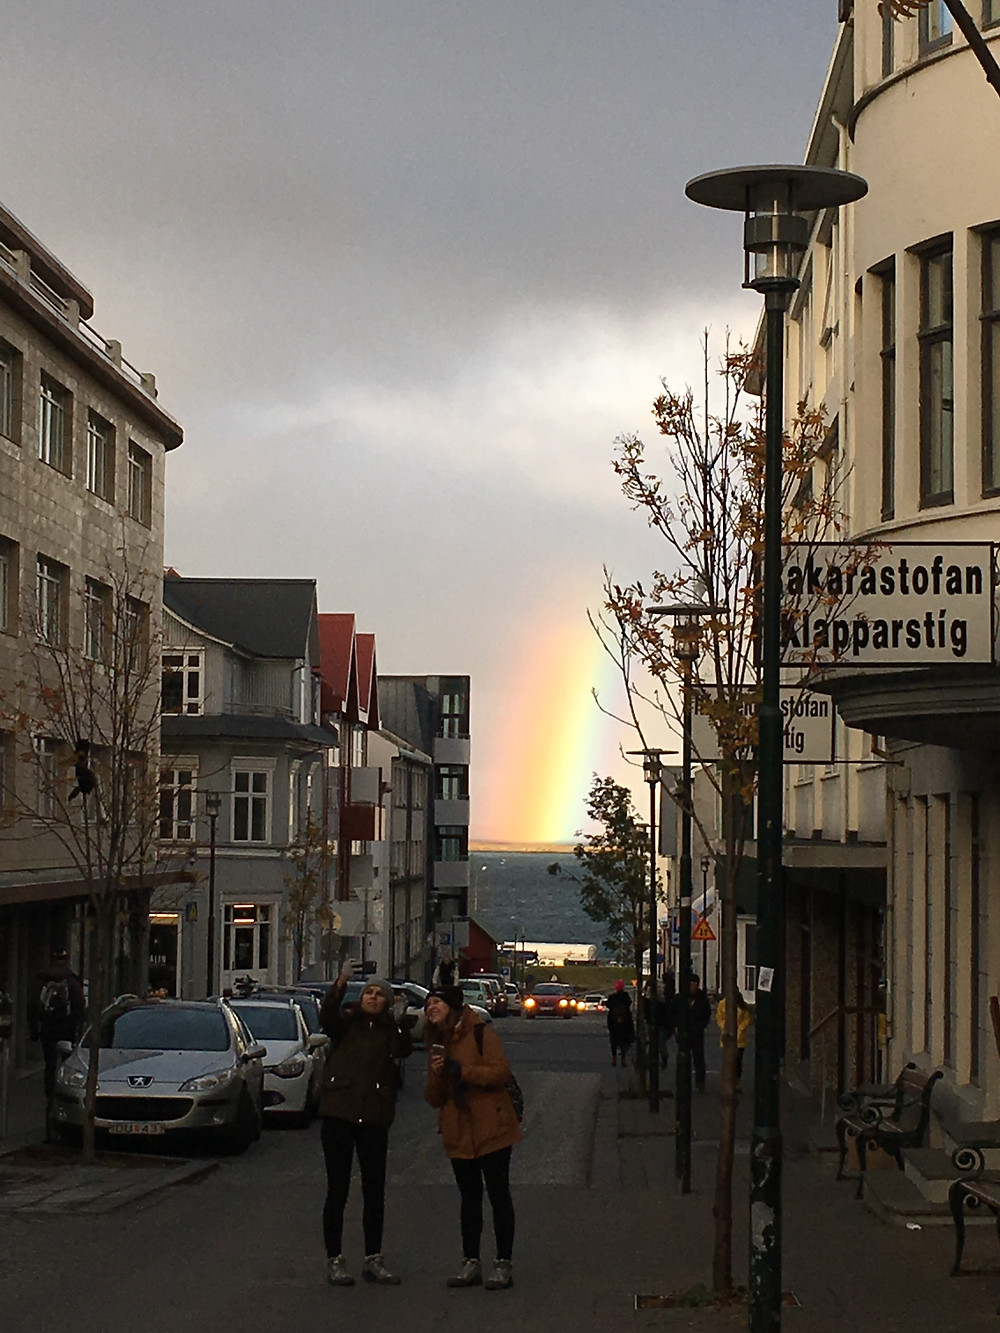 Rainbow in Reykjavik, Iceland